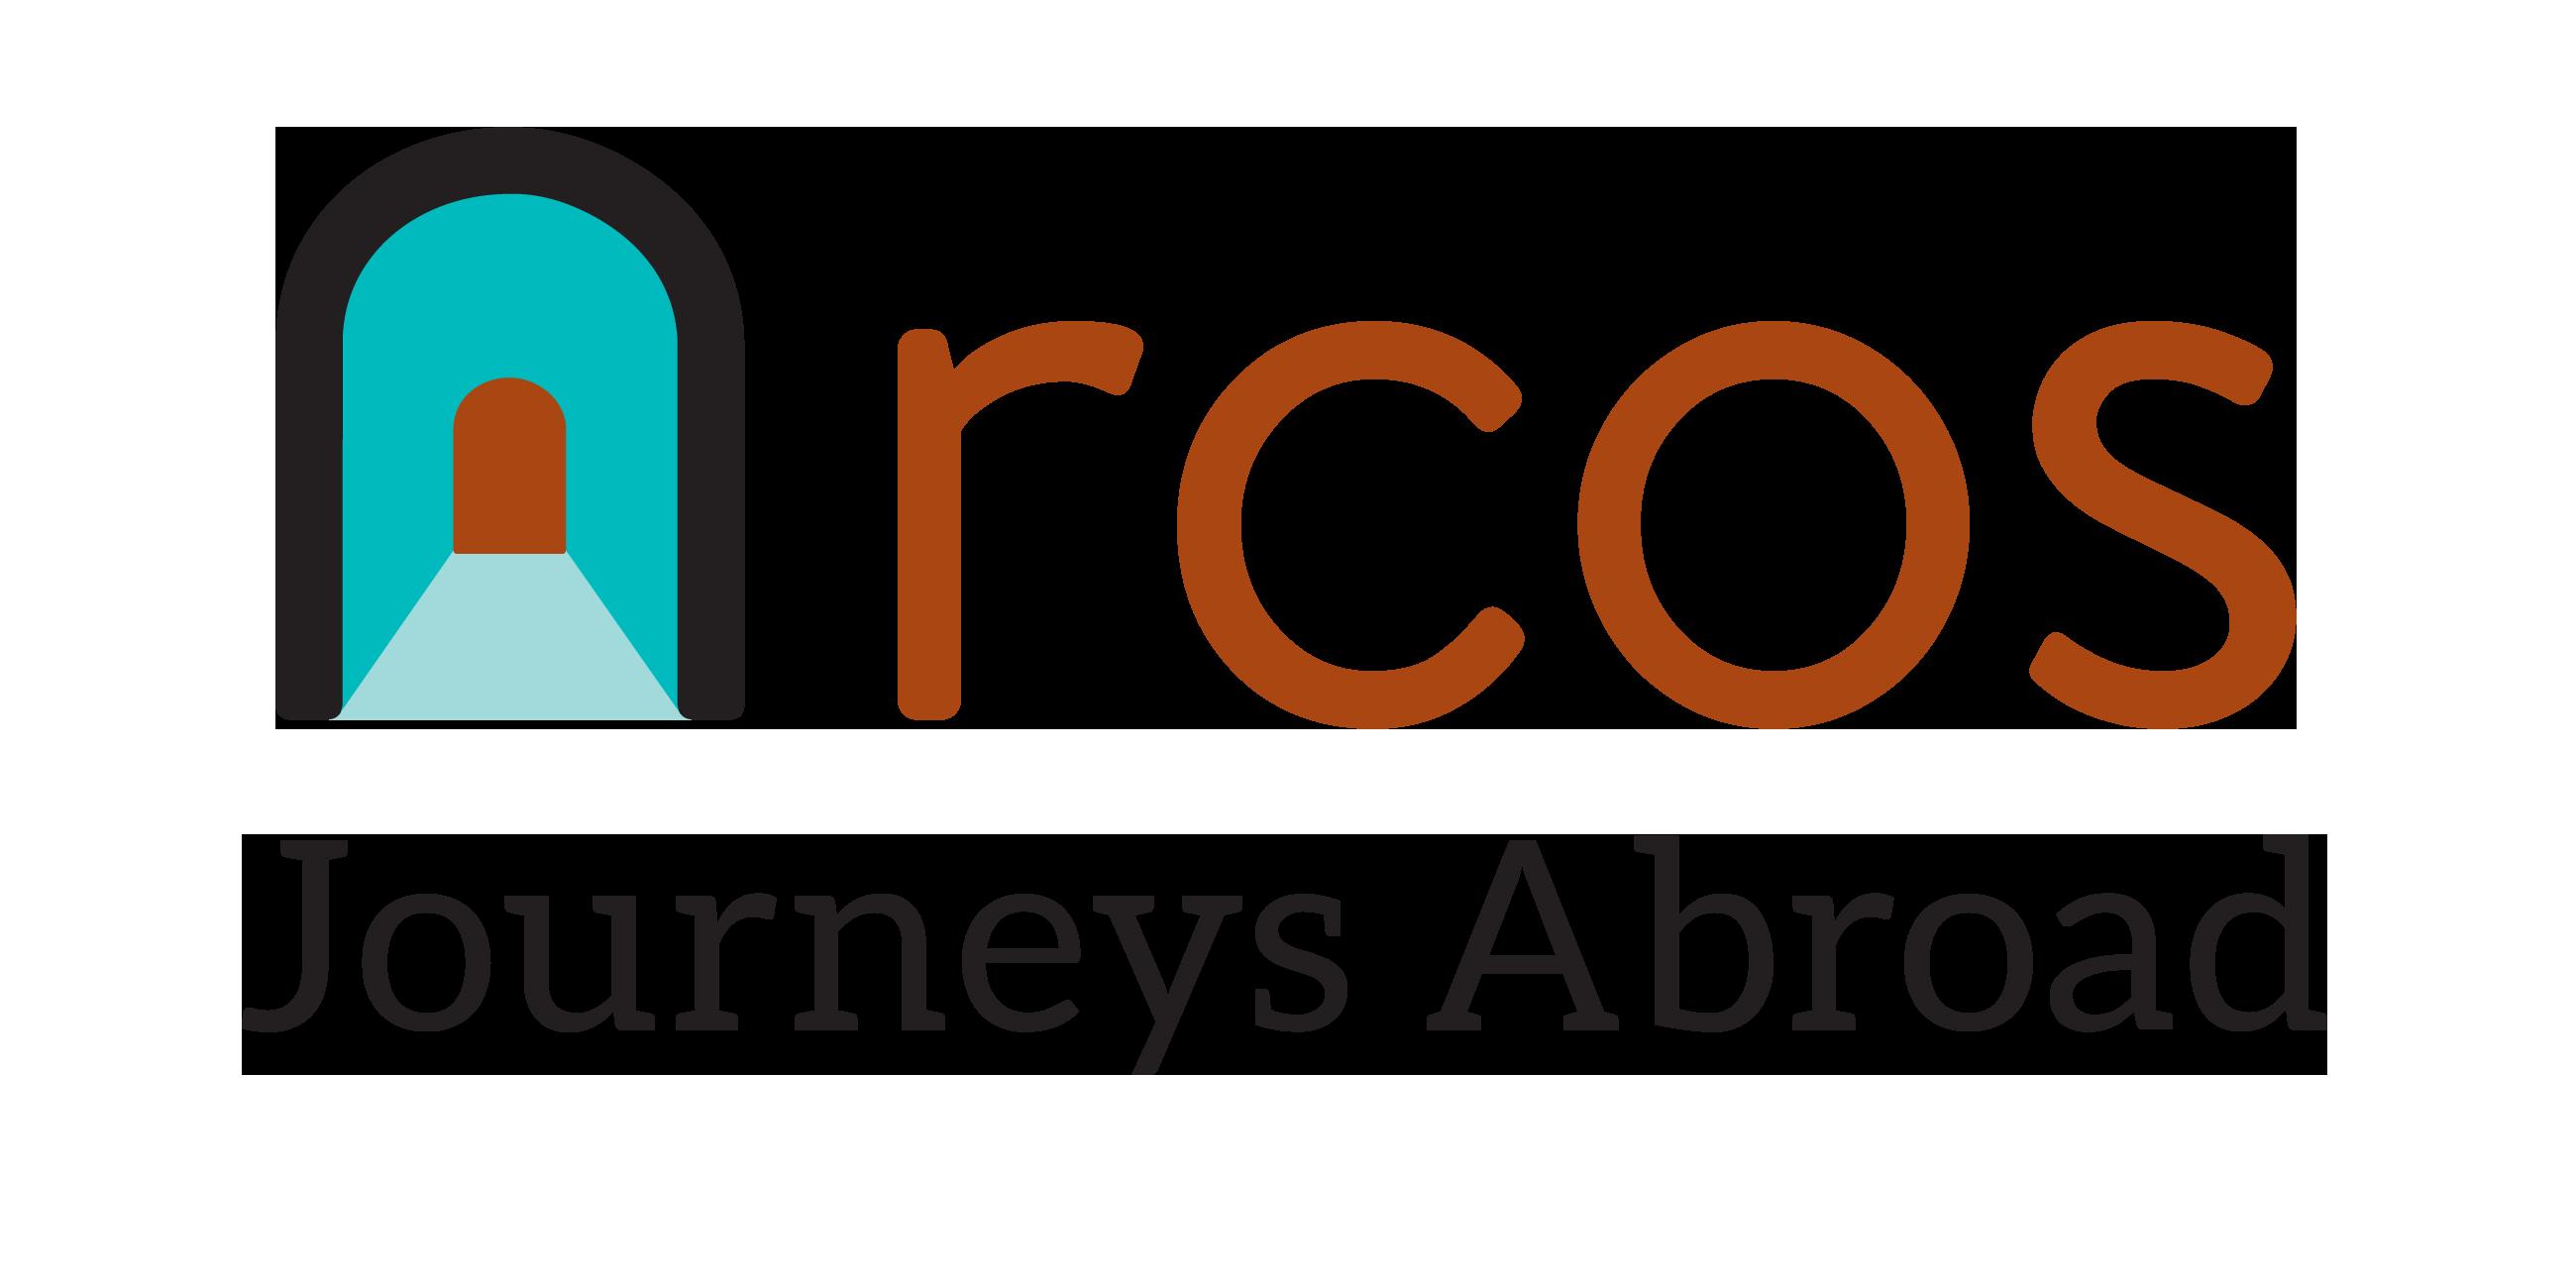 Arcos Journeys: Tropical Discovery & Wellness